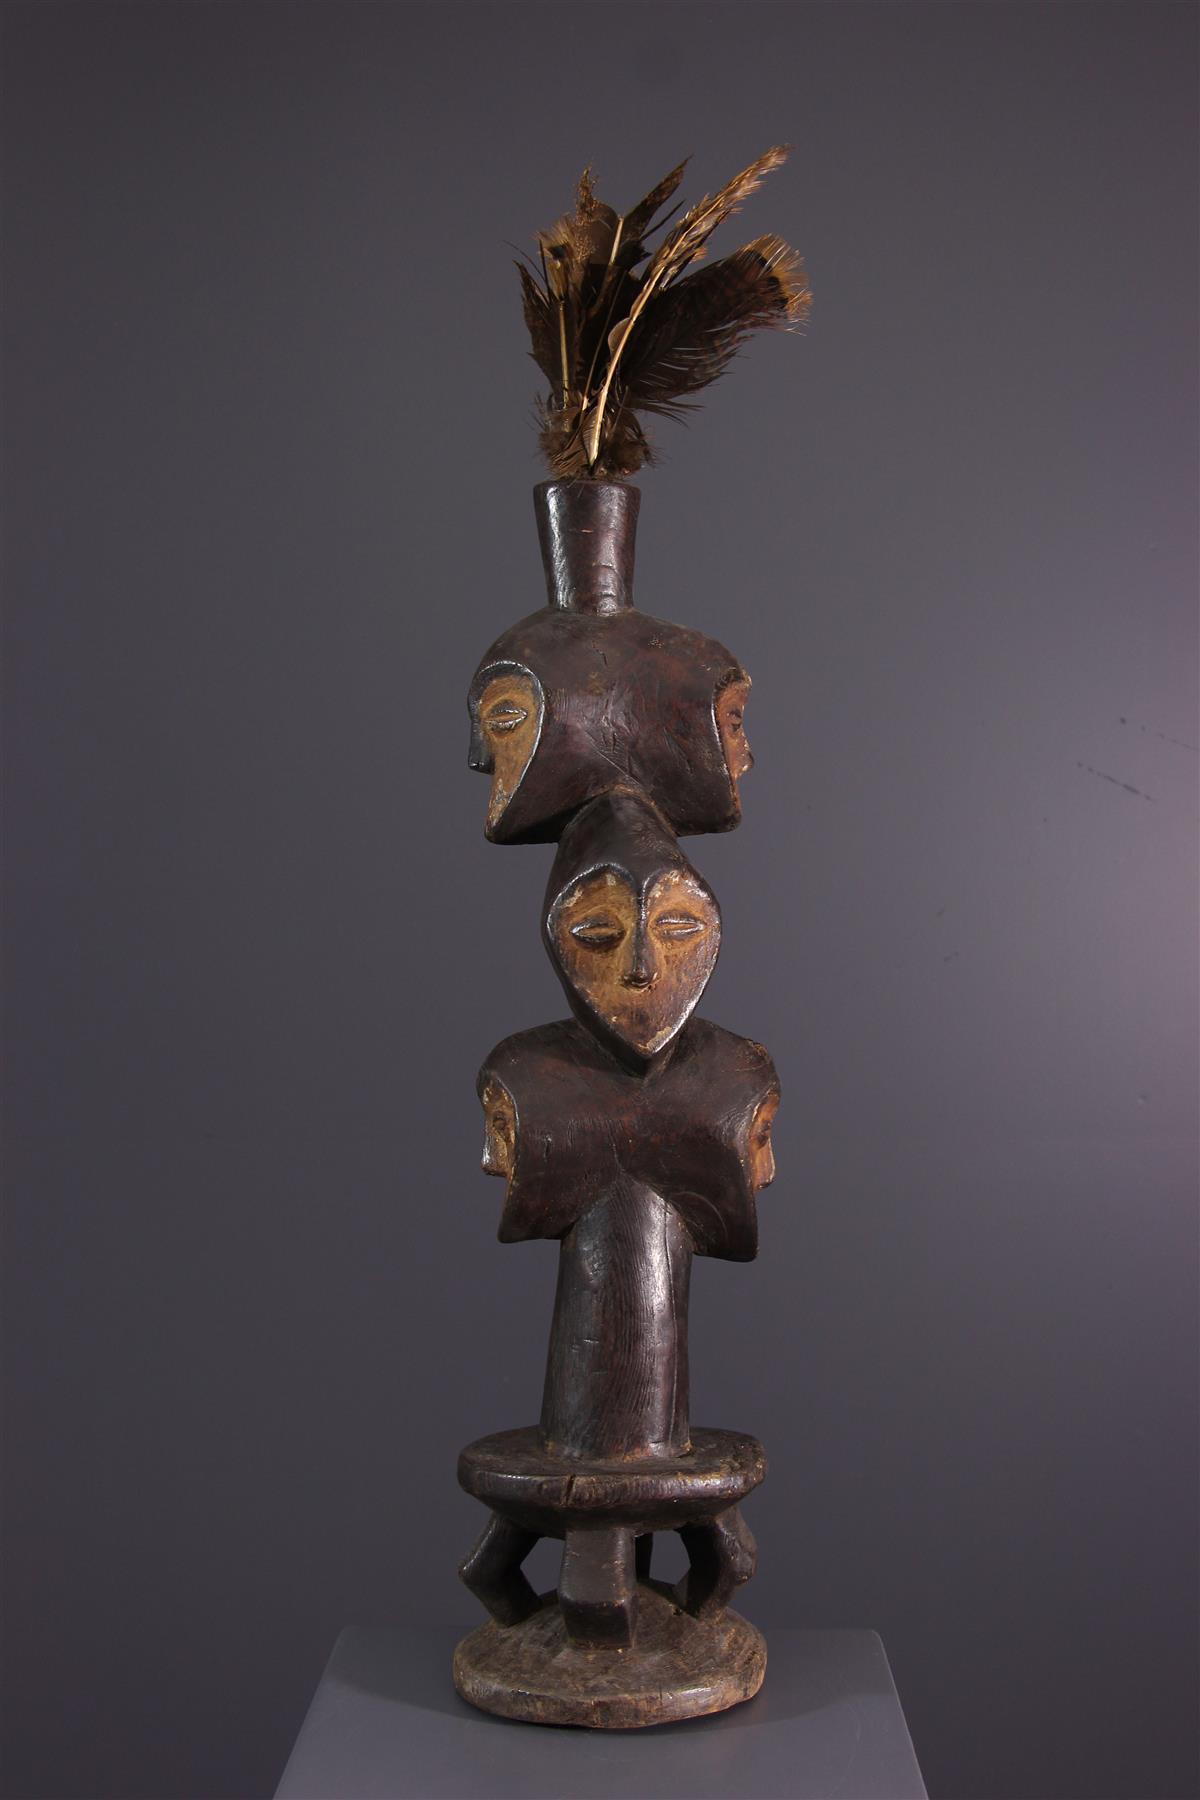 Lega statue - Tribal art